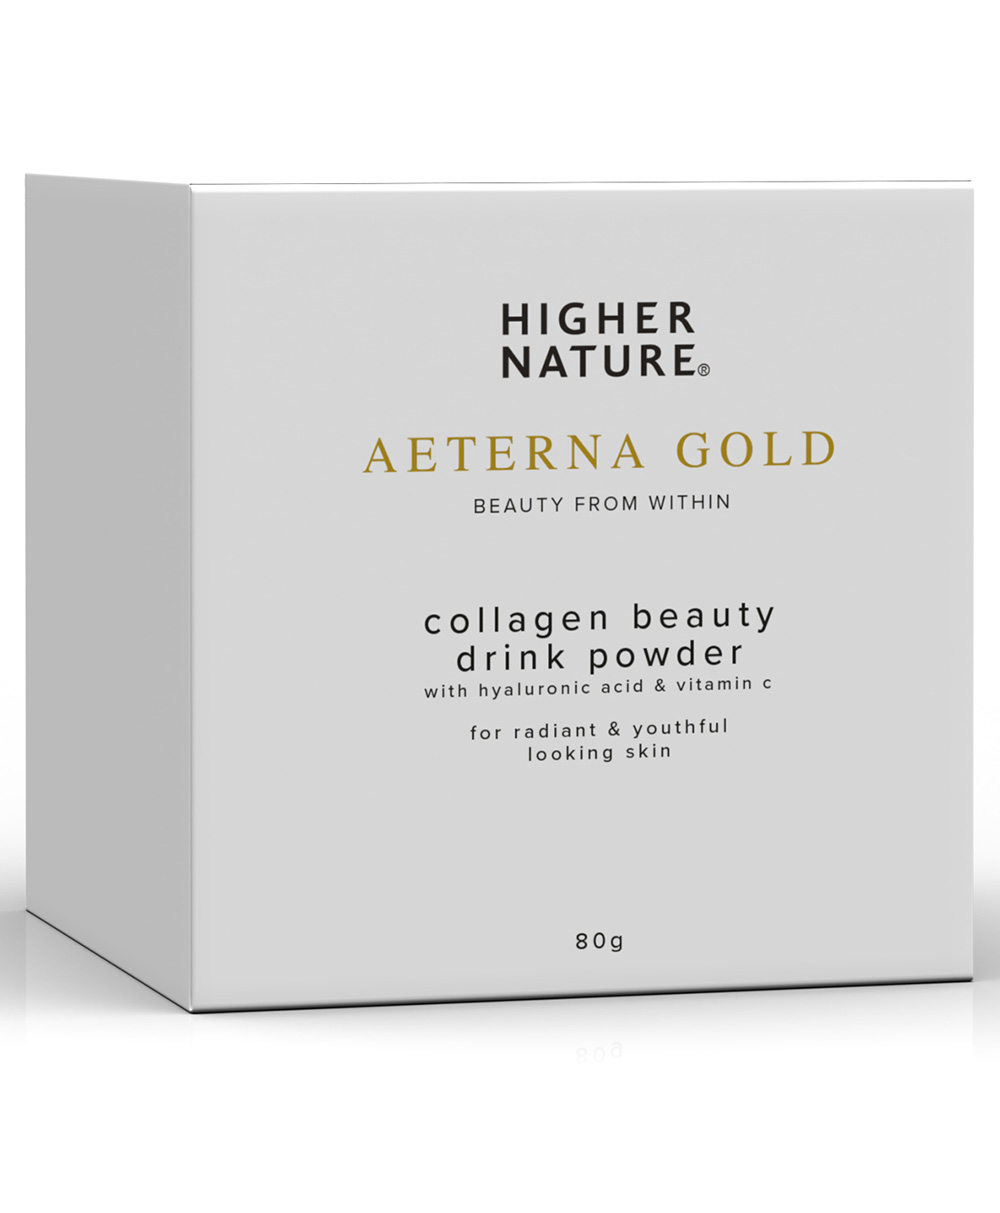 Aeterna Gold Collagen Beauty Drink Powder  80g